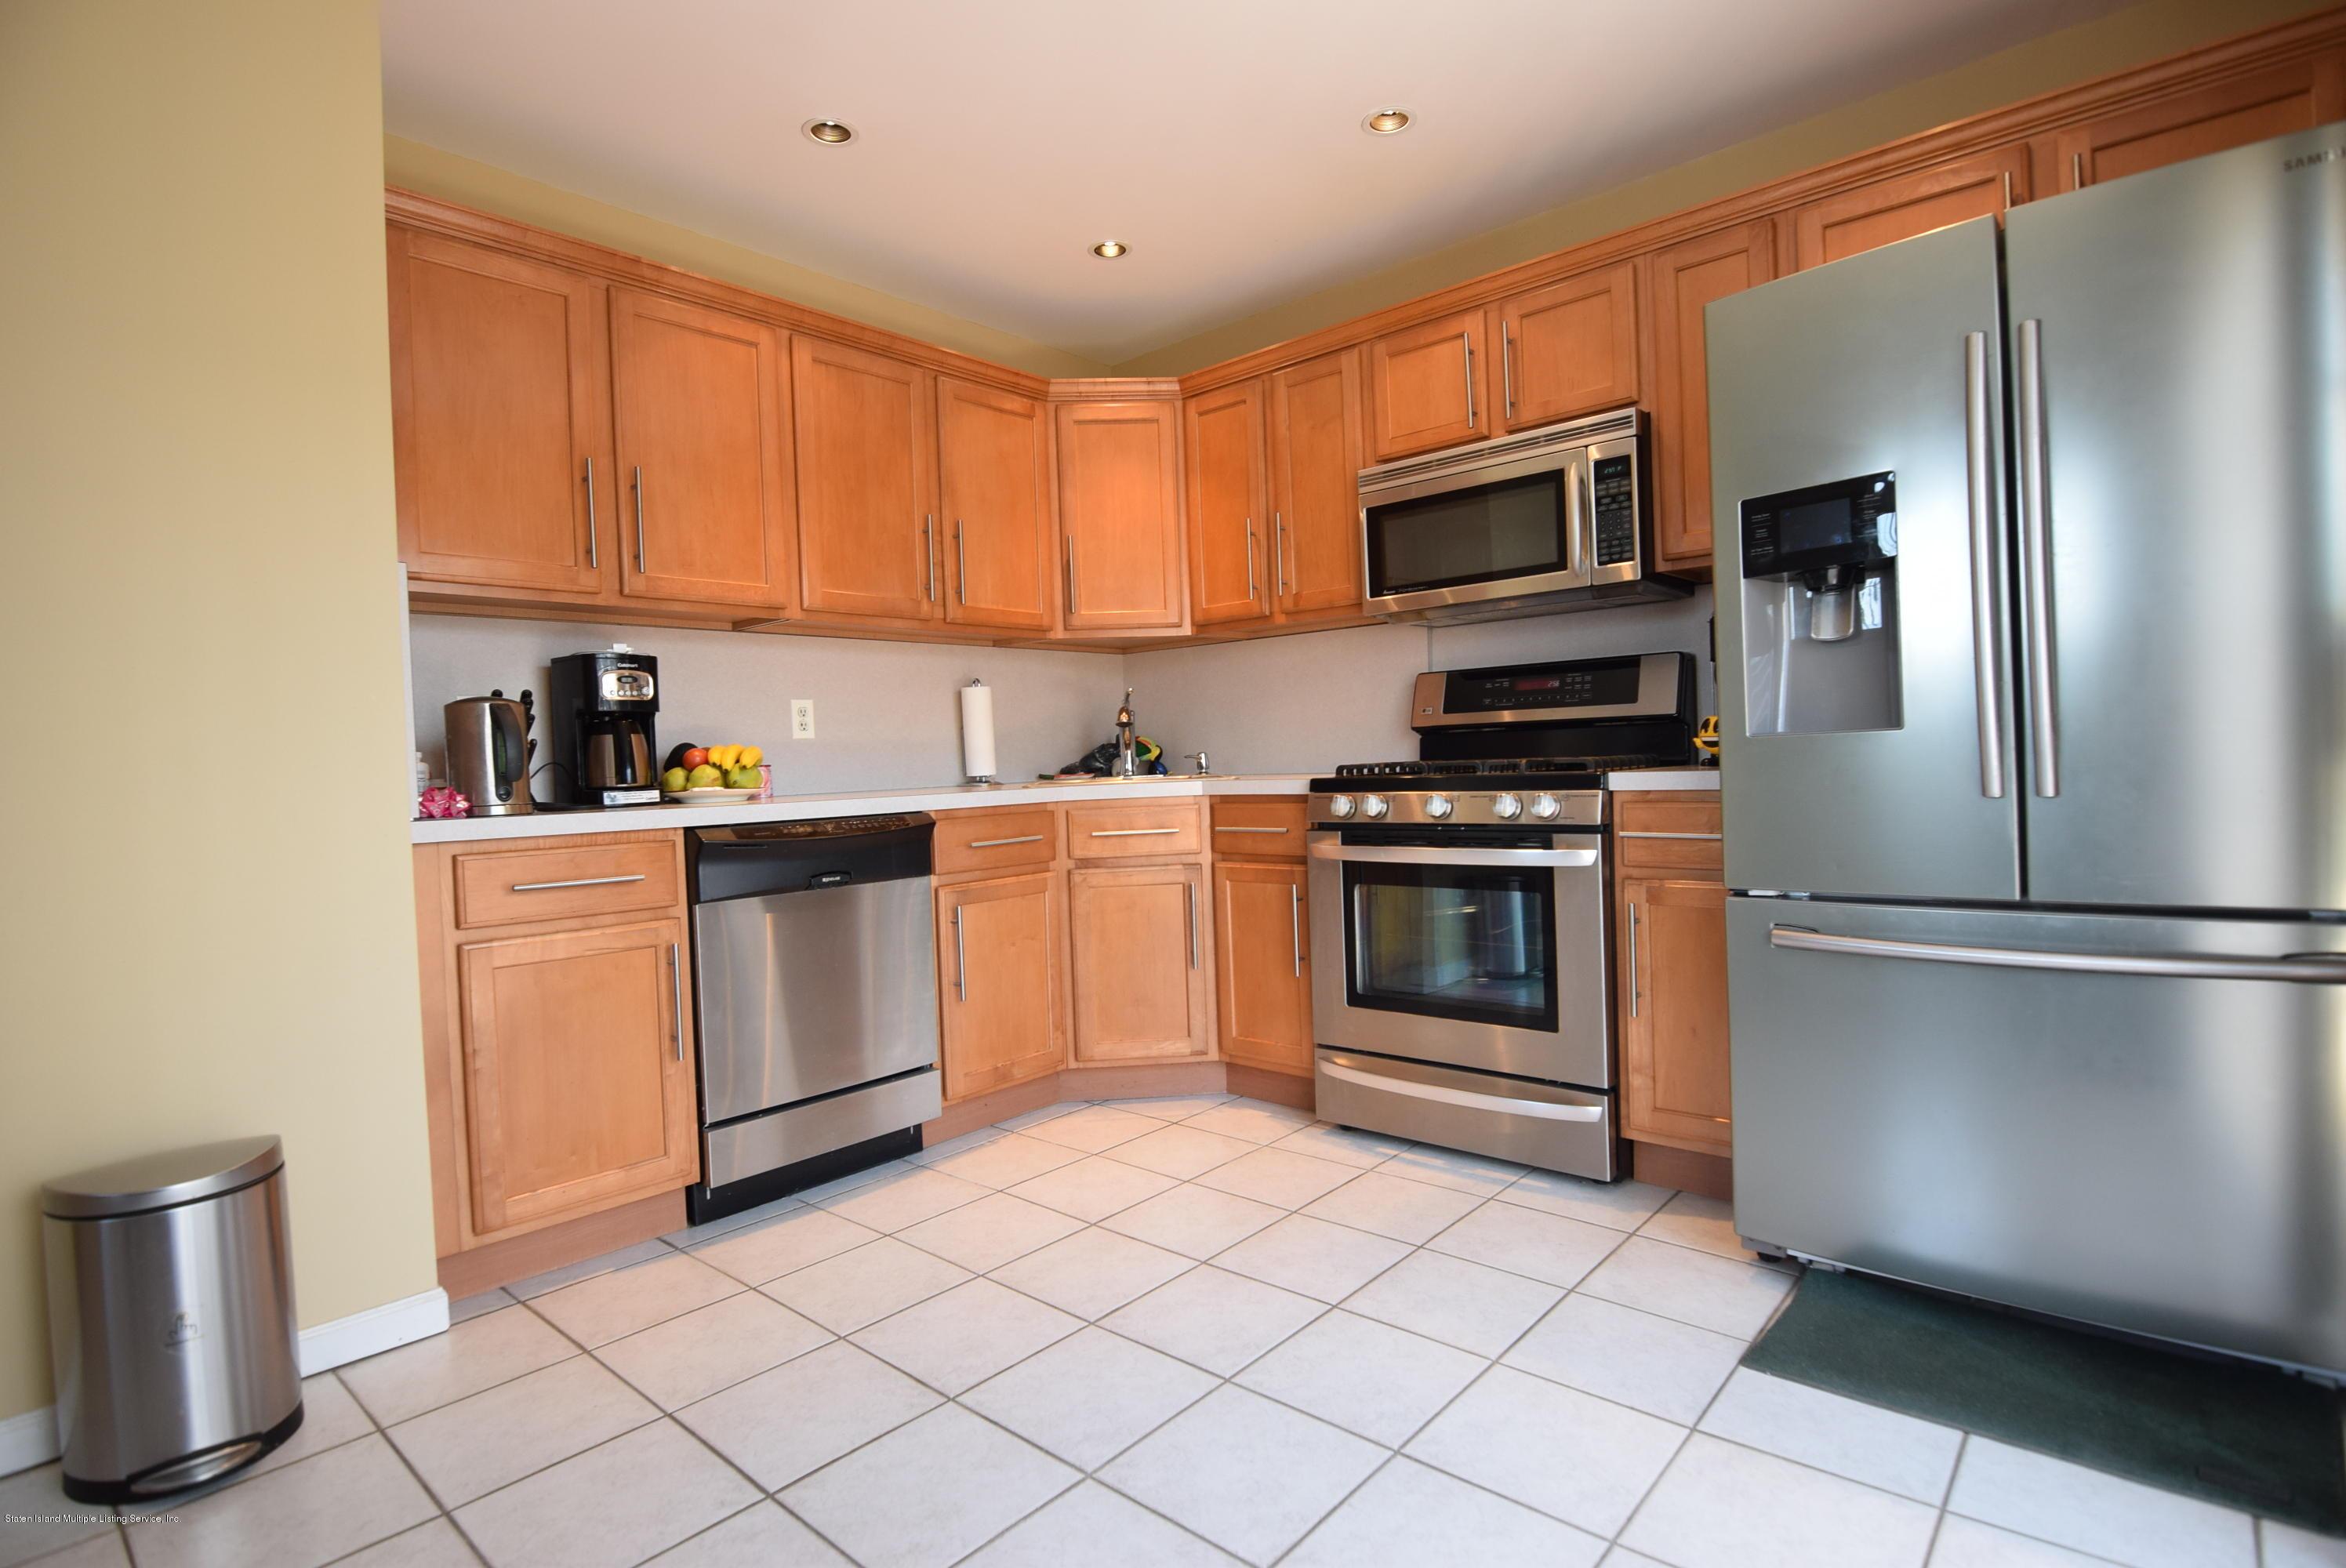 Single Family - Semi-Attached 15 Erwin Court  Staten Island, NY 10306, MLS-1126740-7